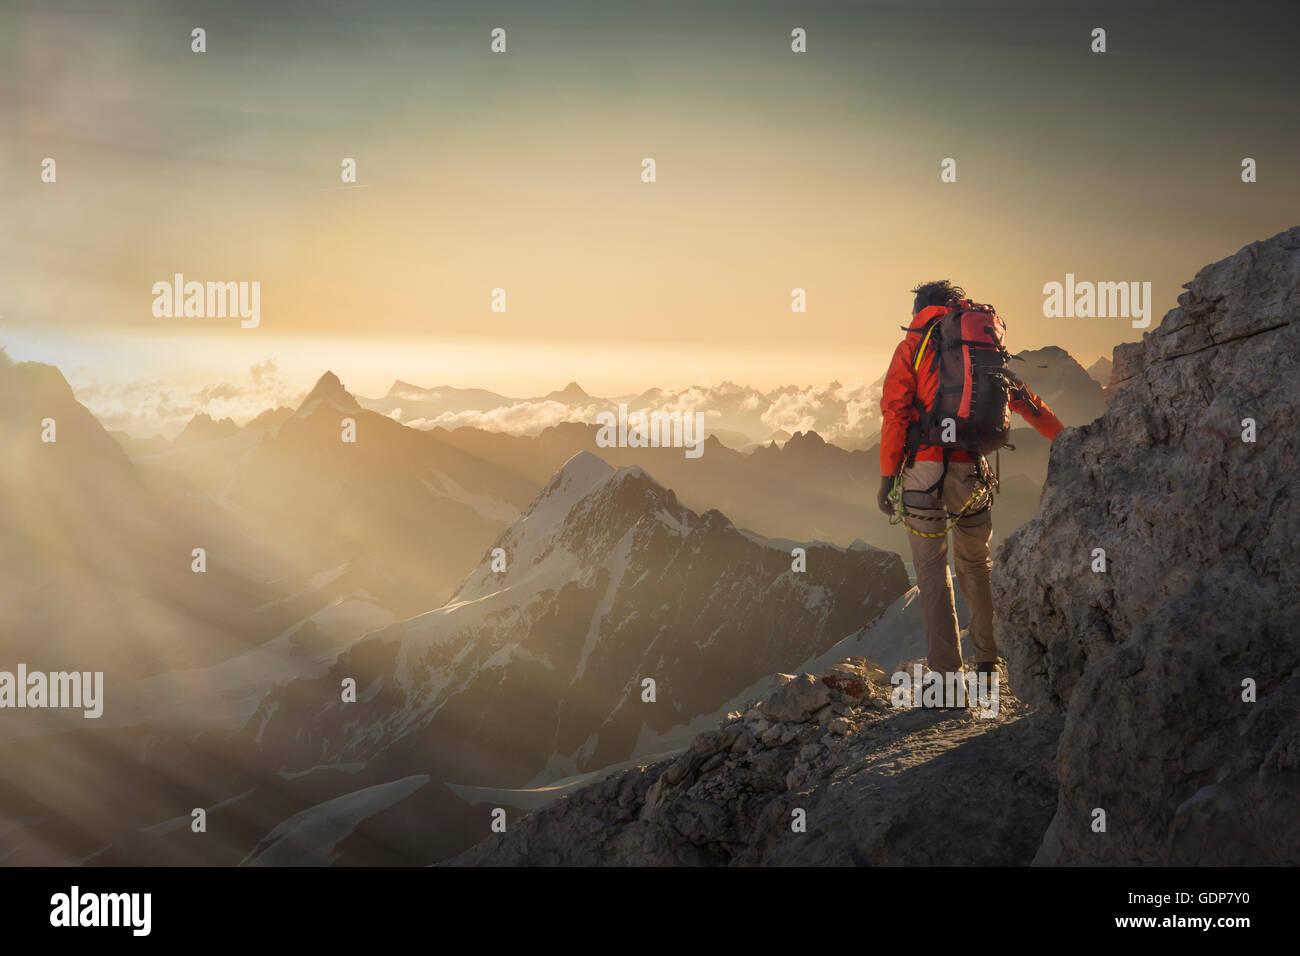 Climber watching a mountain range at sunset, Alps, Canton Wallis, Switzerland - Stock Image